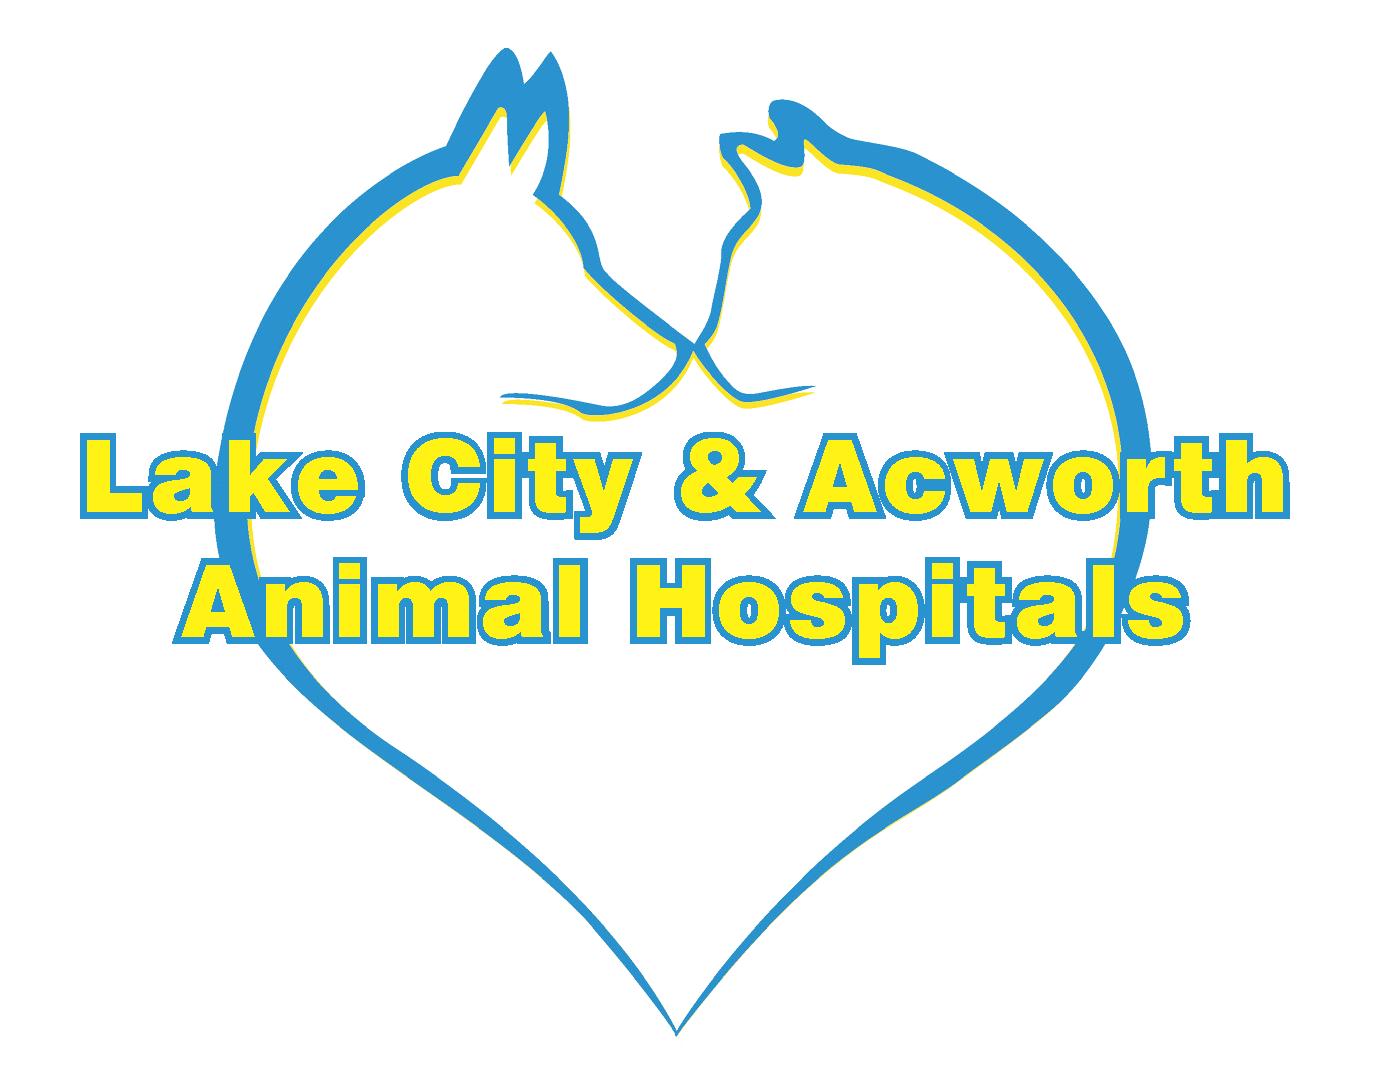 Lake City and Acworth Blue heart